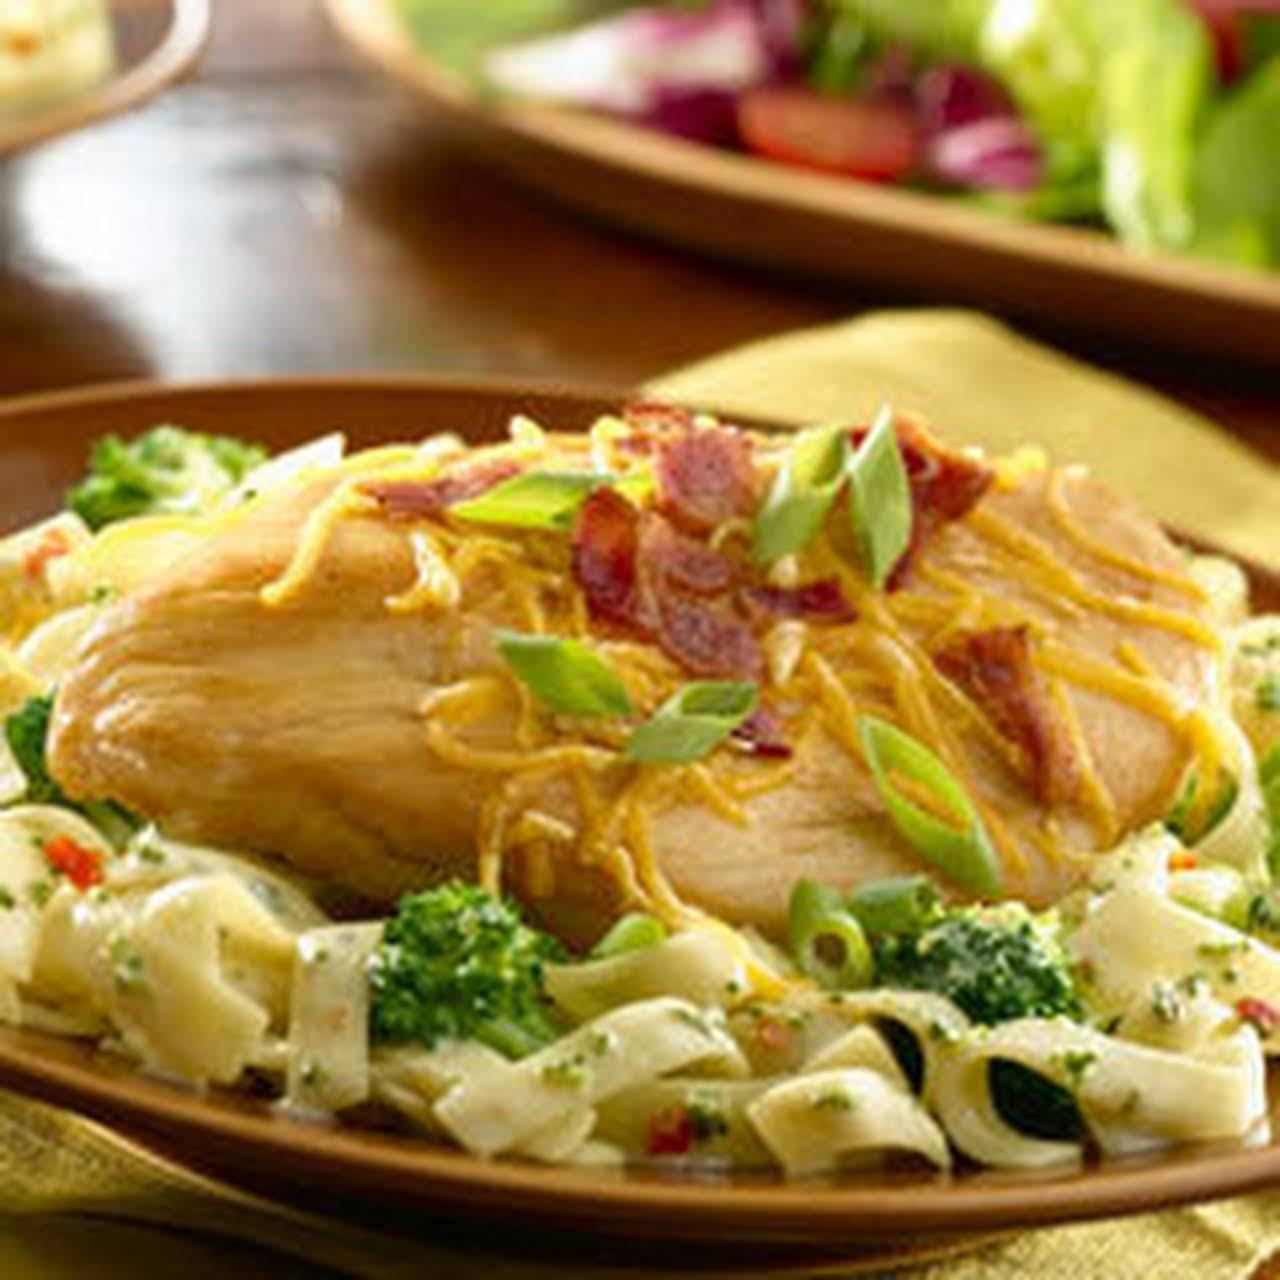 Loaded Chicken Broccoli Pasta